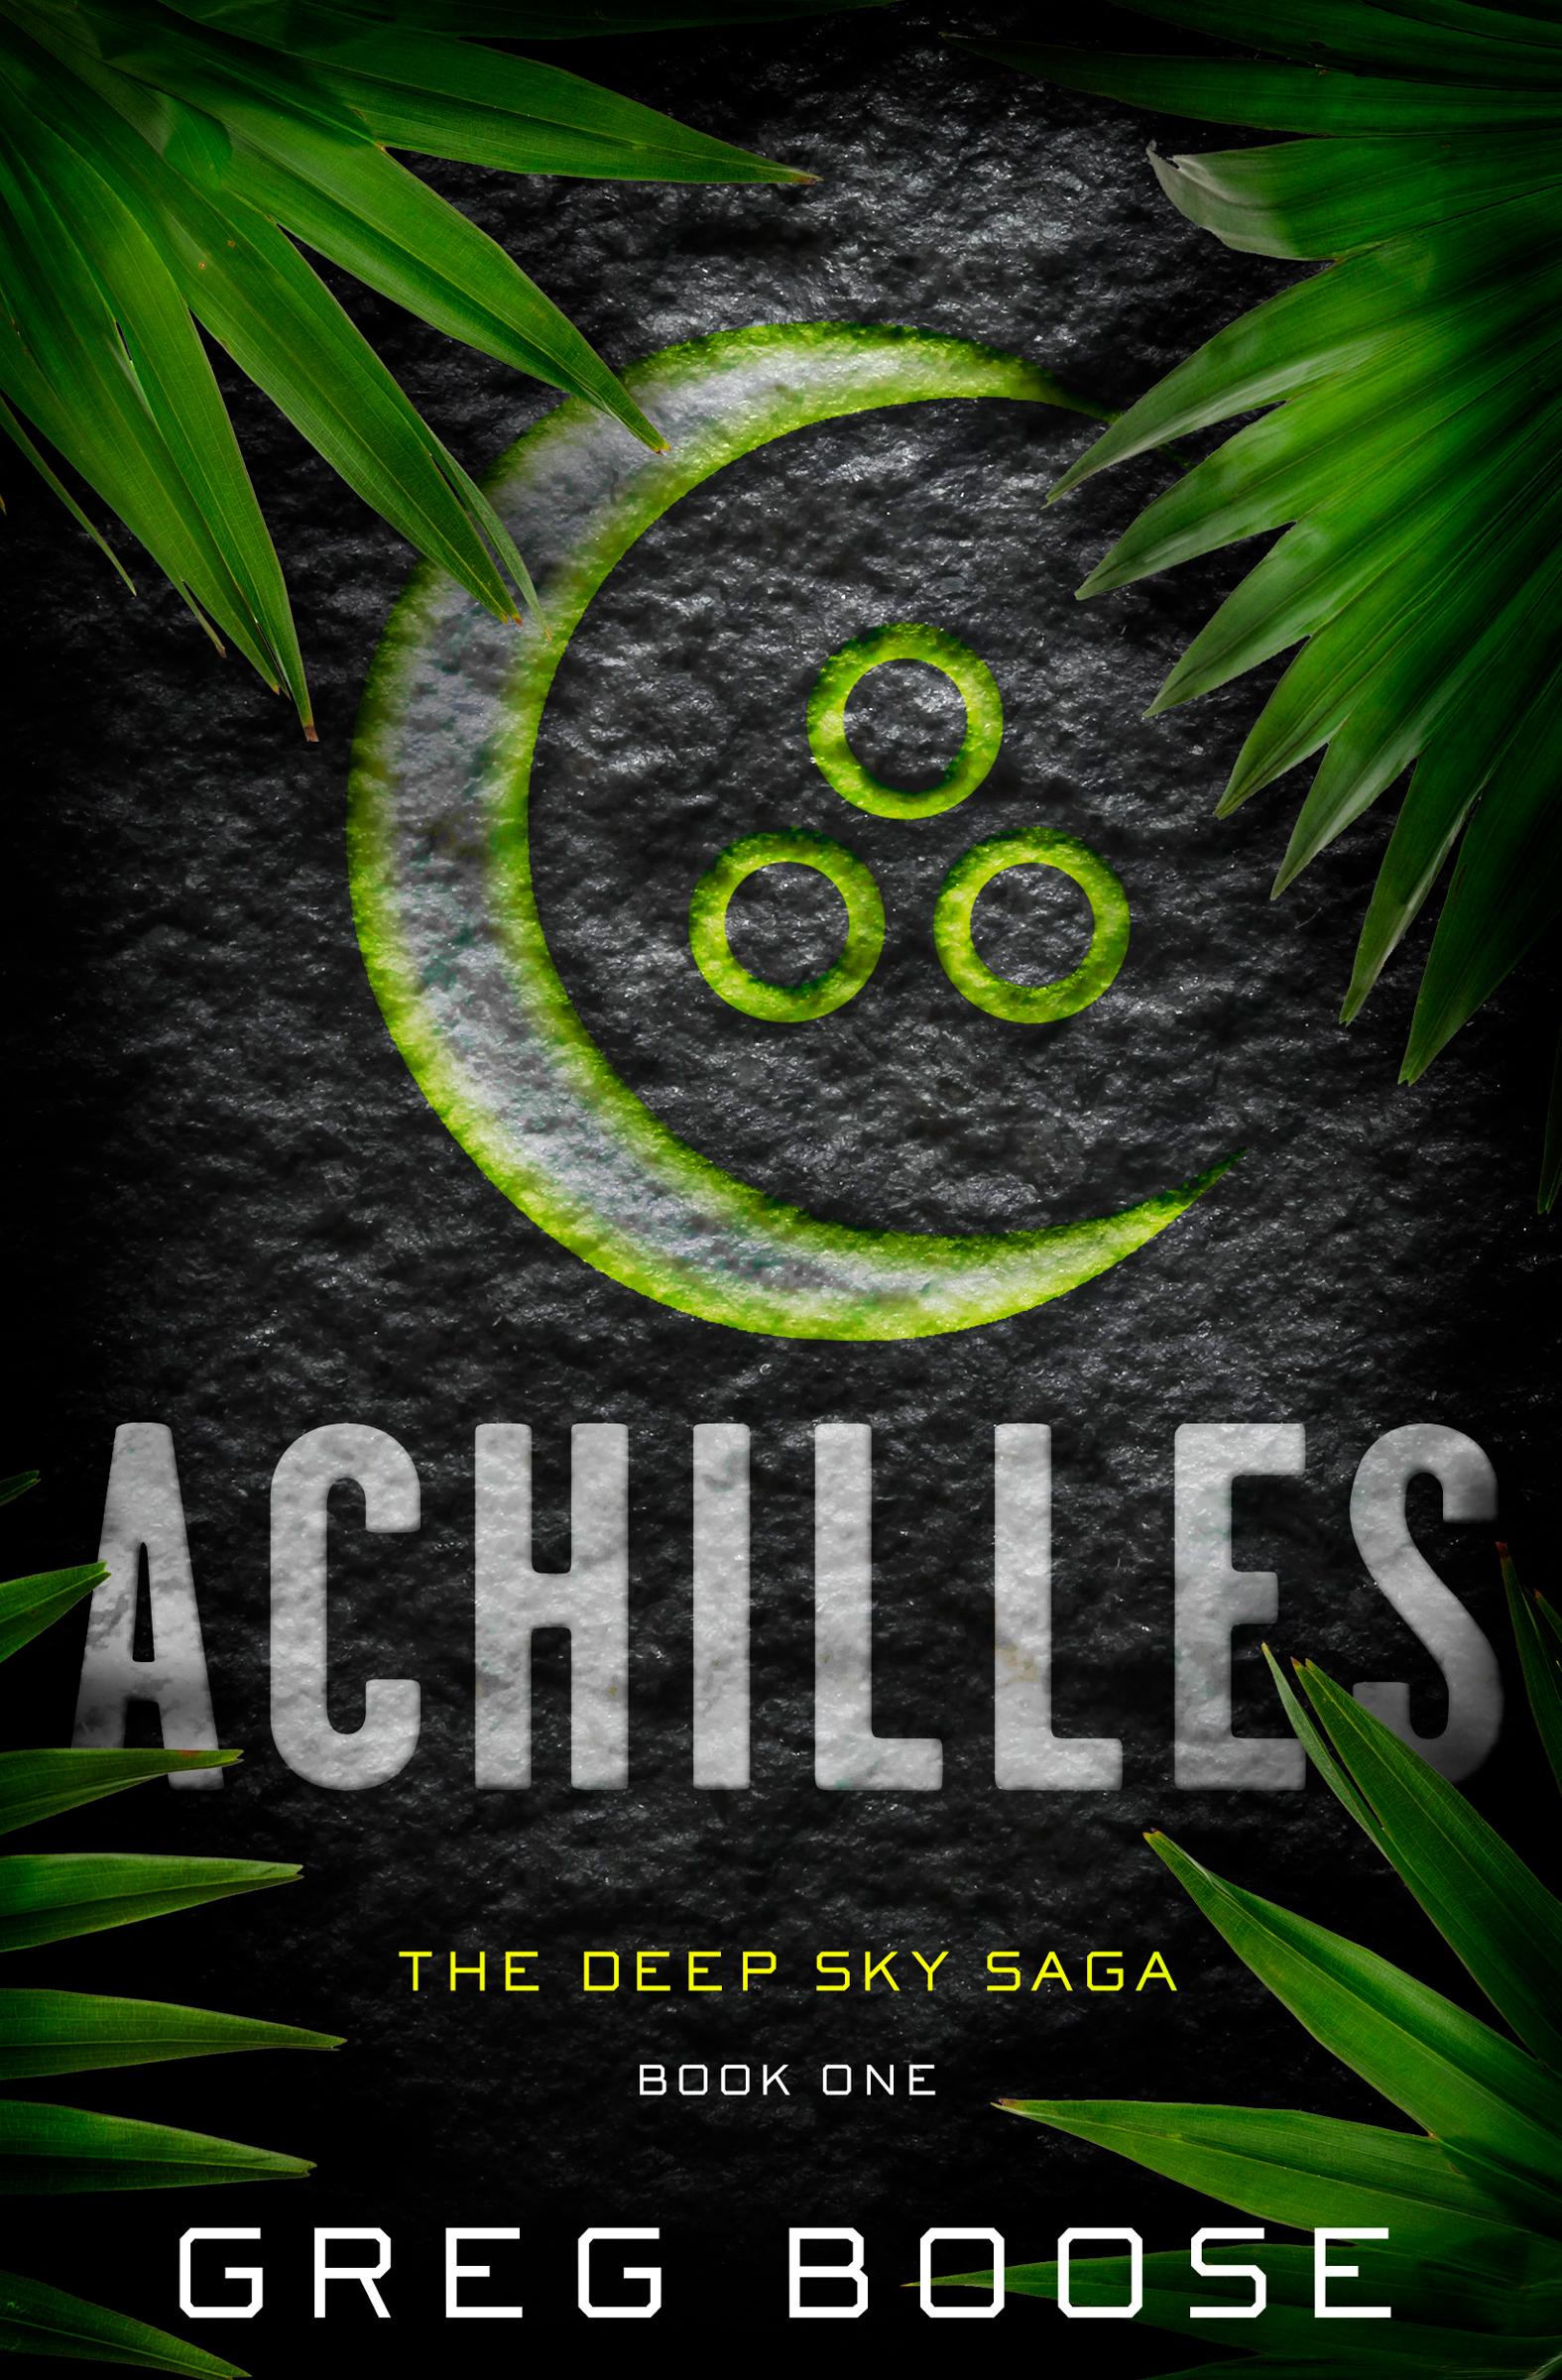 Achilles The Deep Sky Saga - Book One